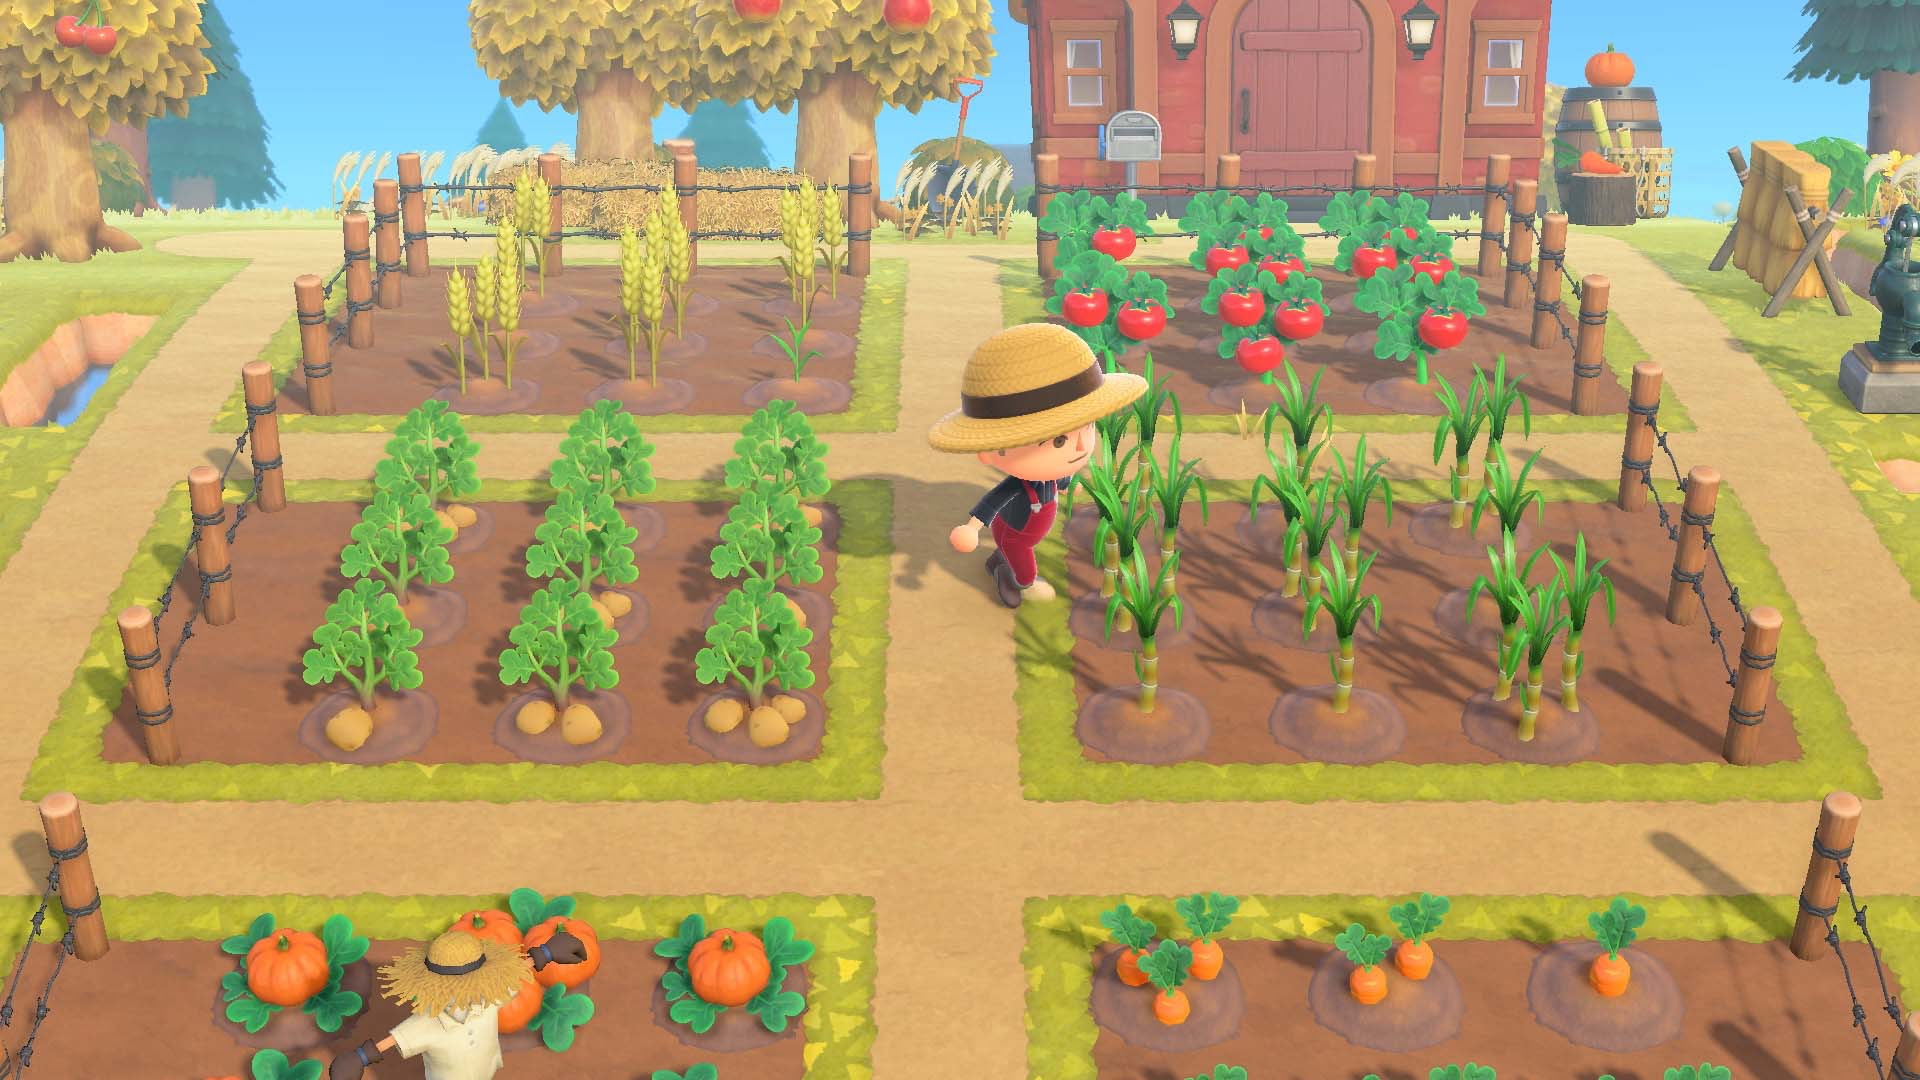 a character with a hat running through a garden